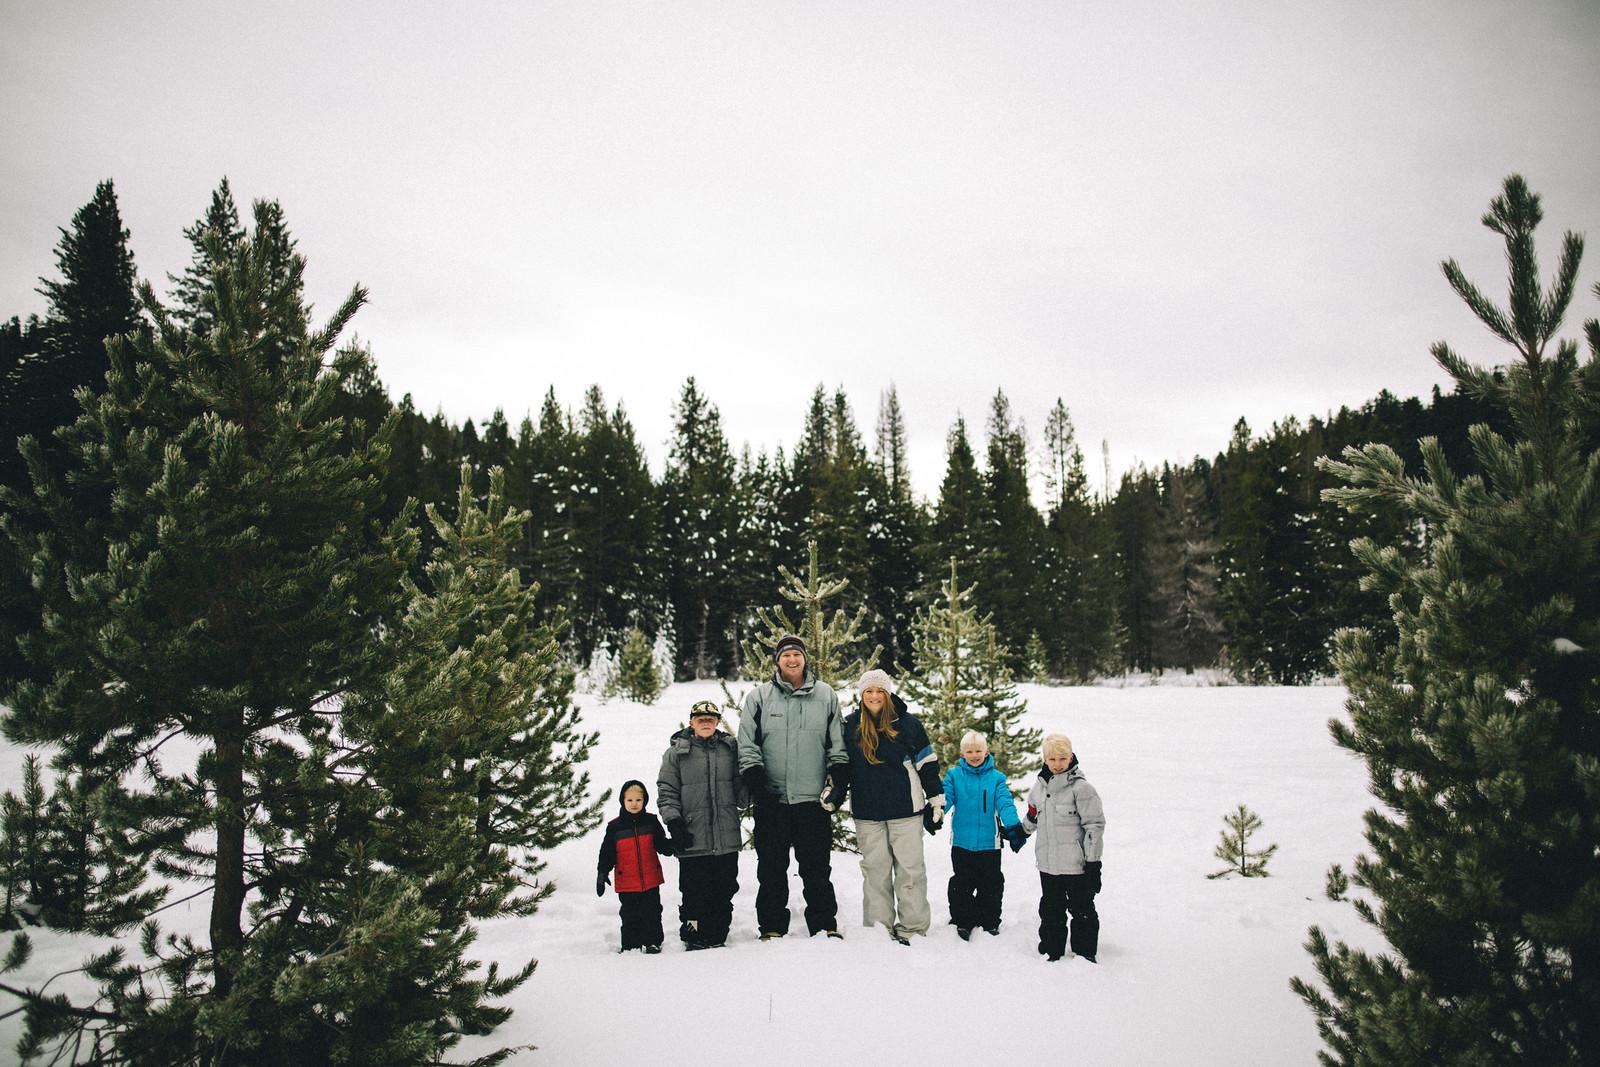 DecemberSequoiaSnow001-2-X3.jpg